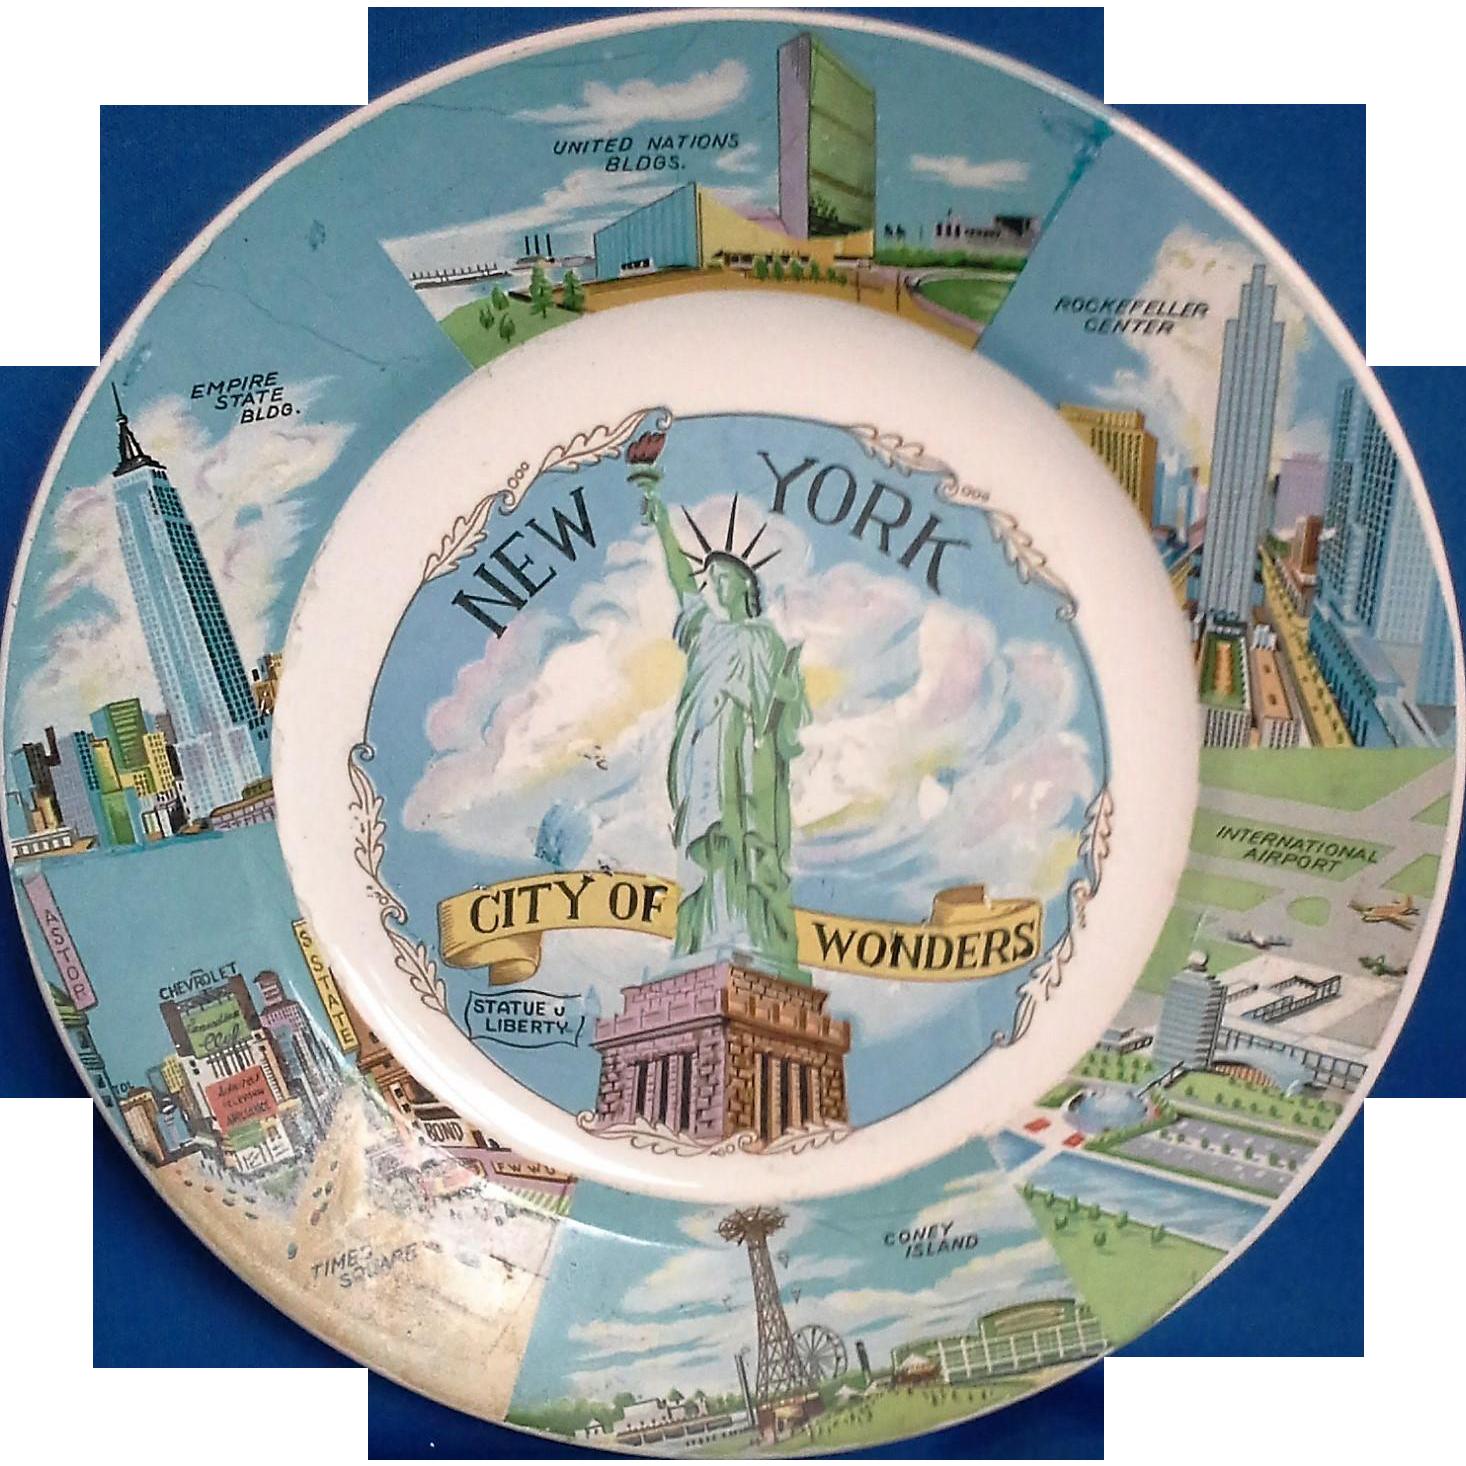 New York City of Wonders Vintage Souvenir Plate 1950-60s